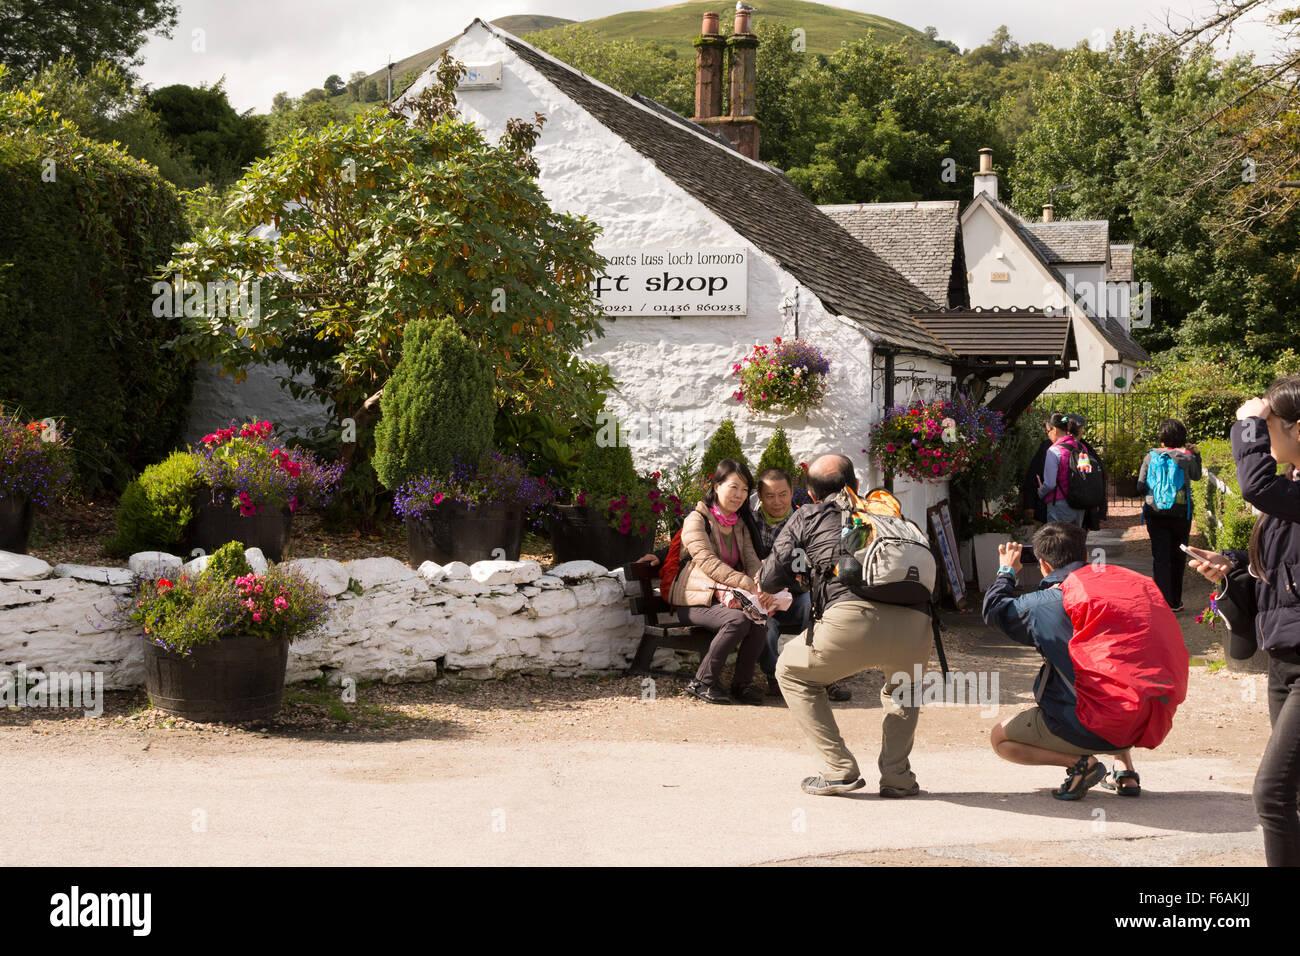 Tourists taking photographs outside traditional Scottish cottage shop in Luss,  Scotland, UK - Stock Image